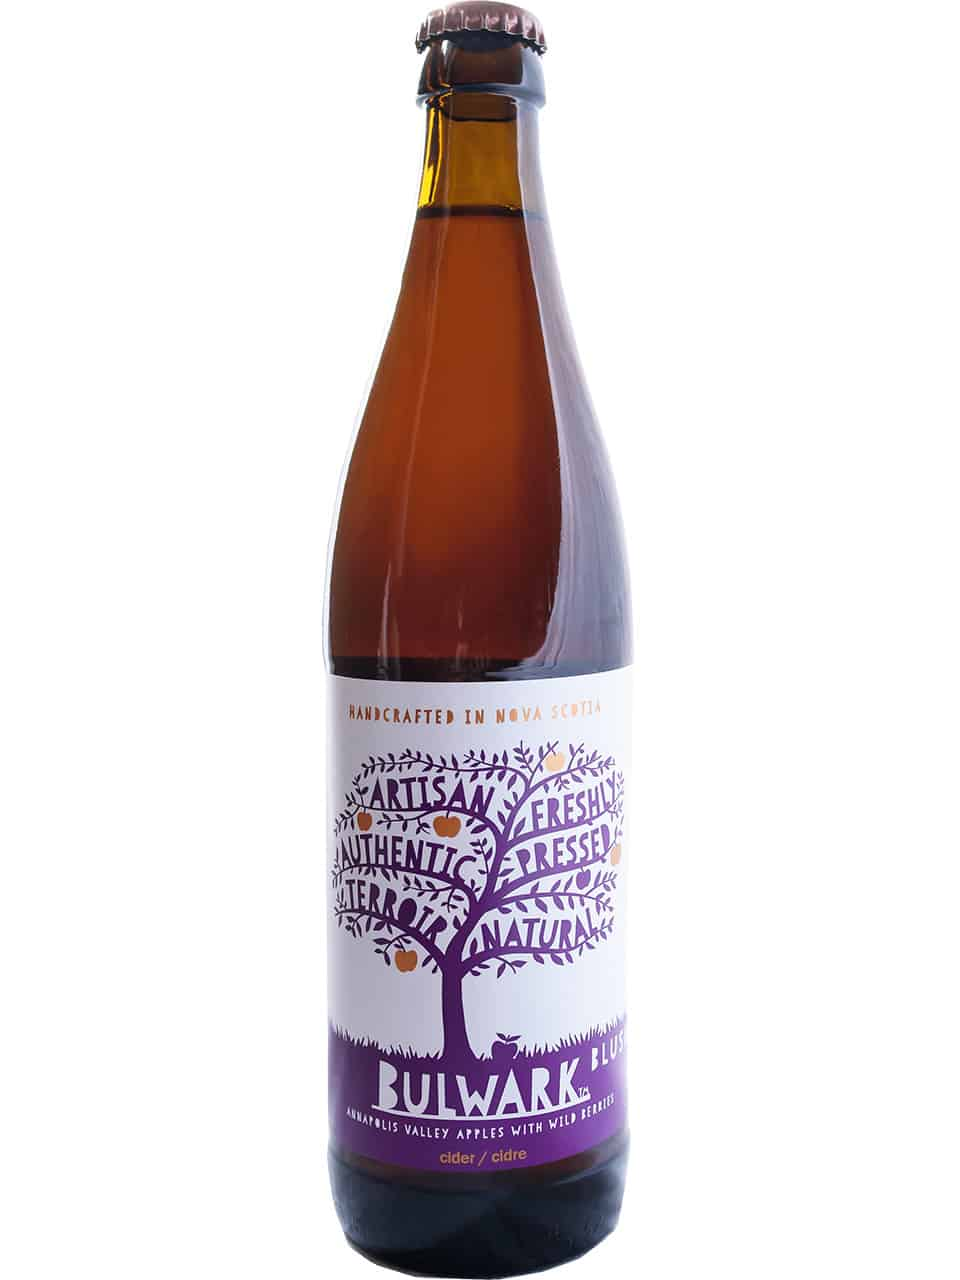 Bulwark Blush Cider 500ml Bottle